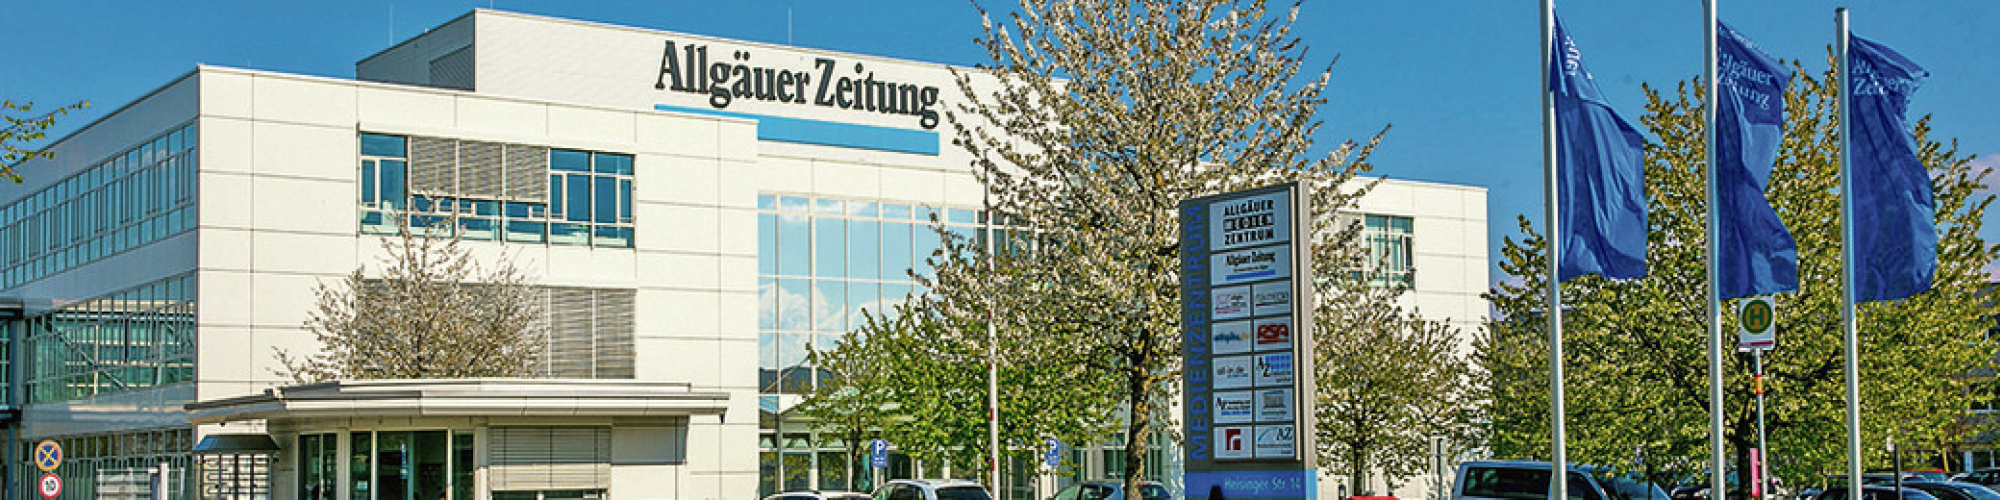 Mediengruppe Allgäuer Zeitung